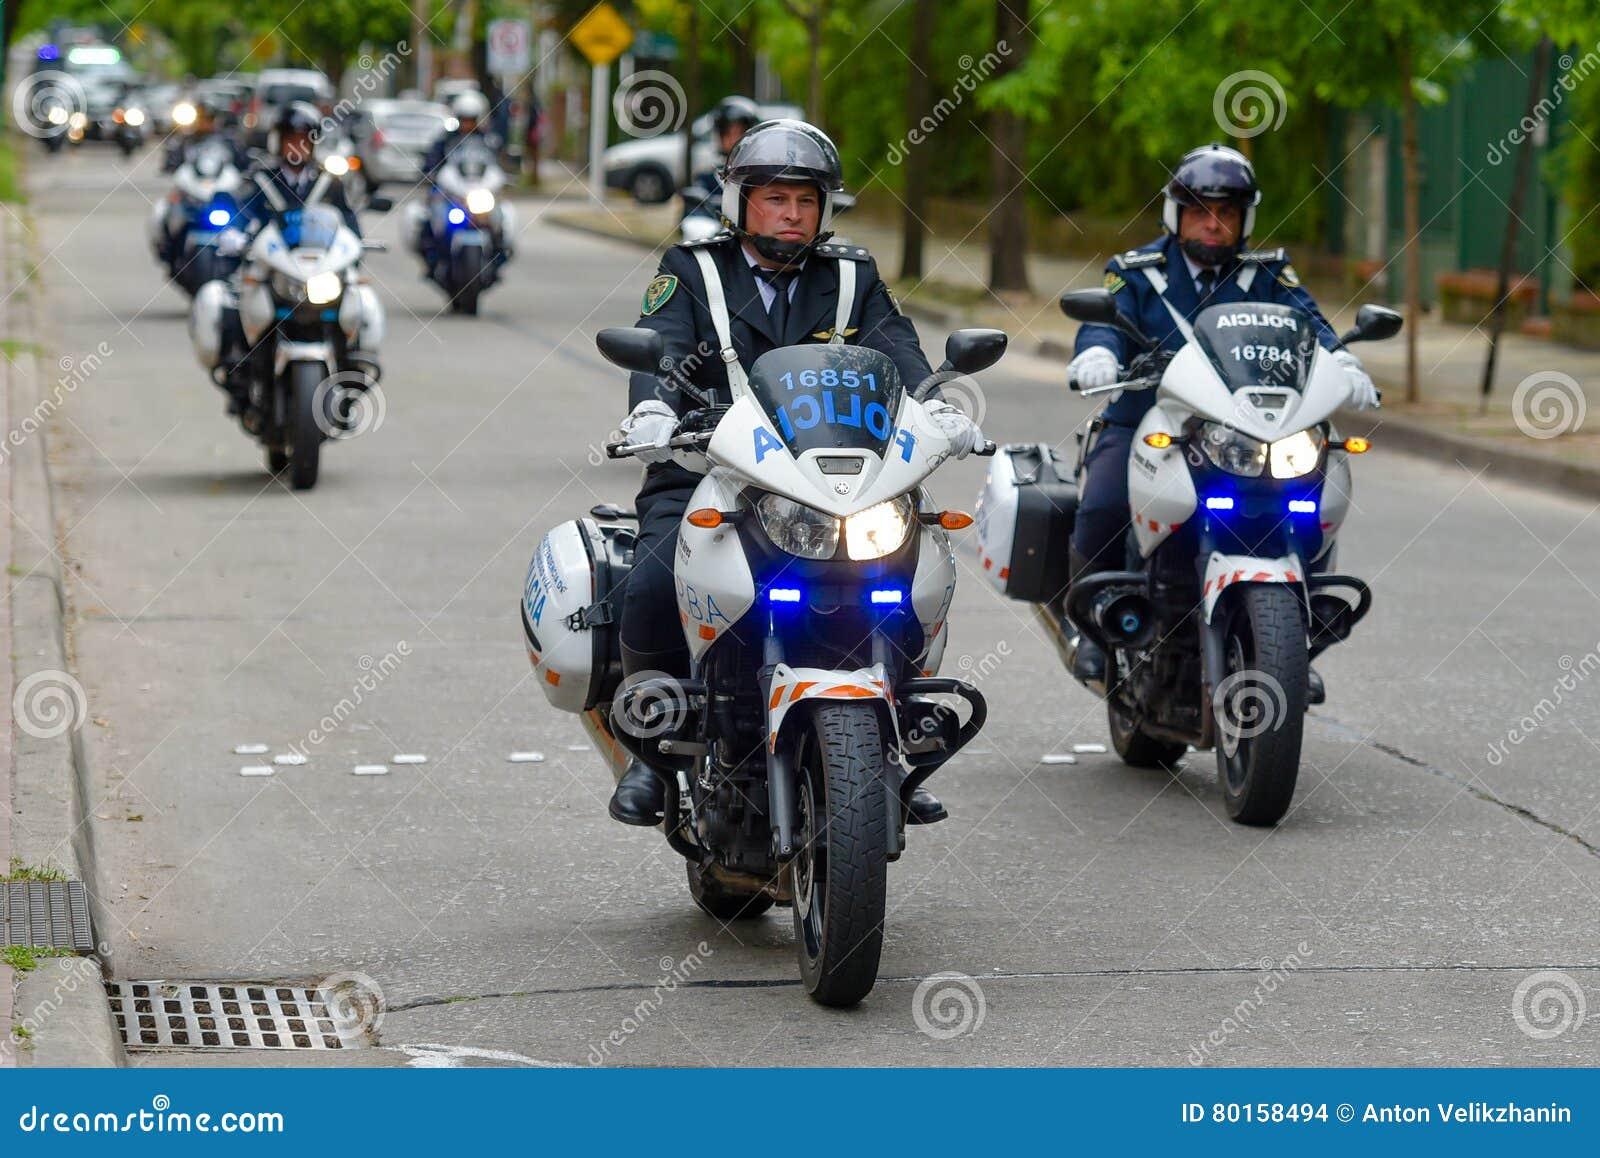 escorte de moto de police image stock ditorial image du motocycliste 80158494. Black Bedroom Furniture Sets. Home Design Ideas